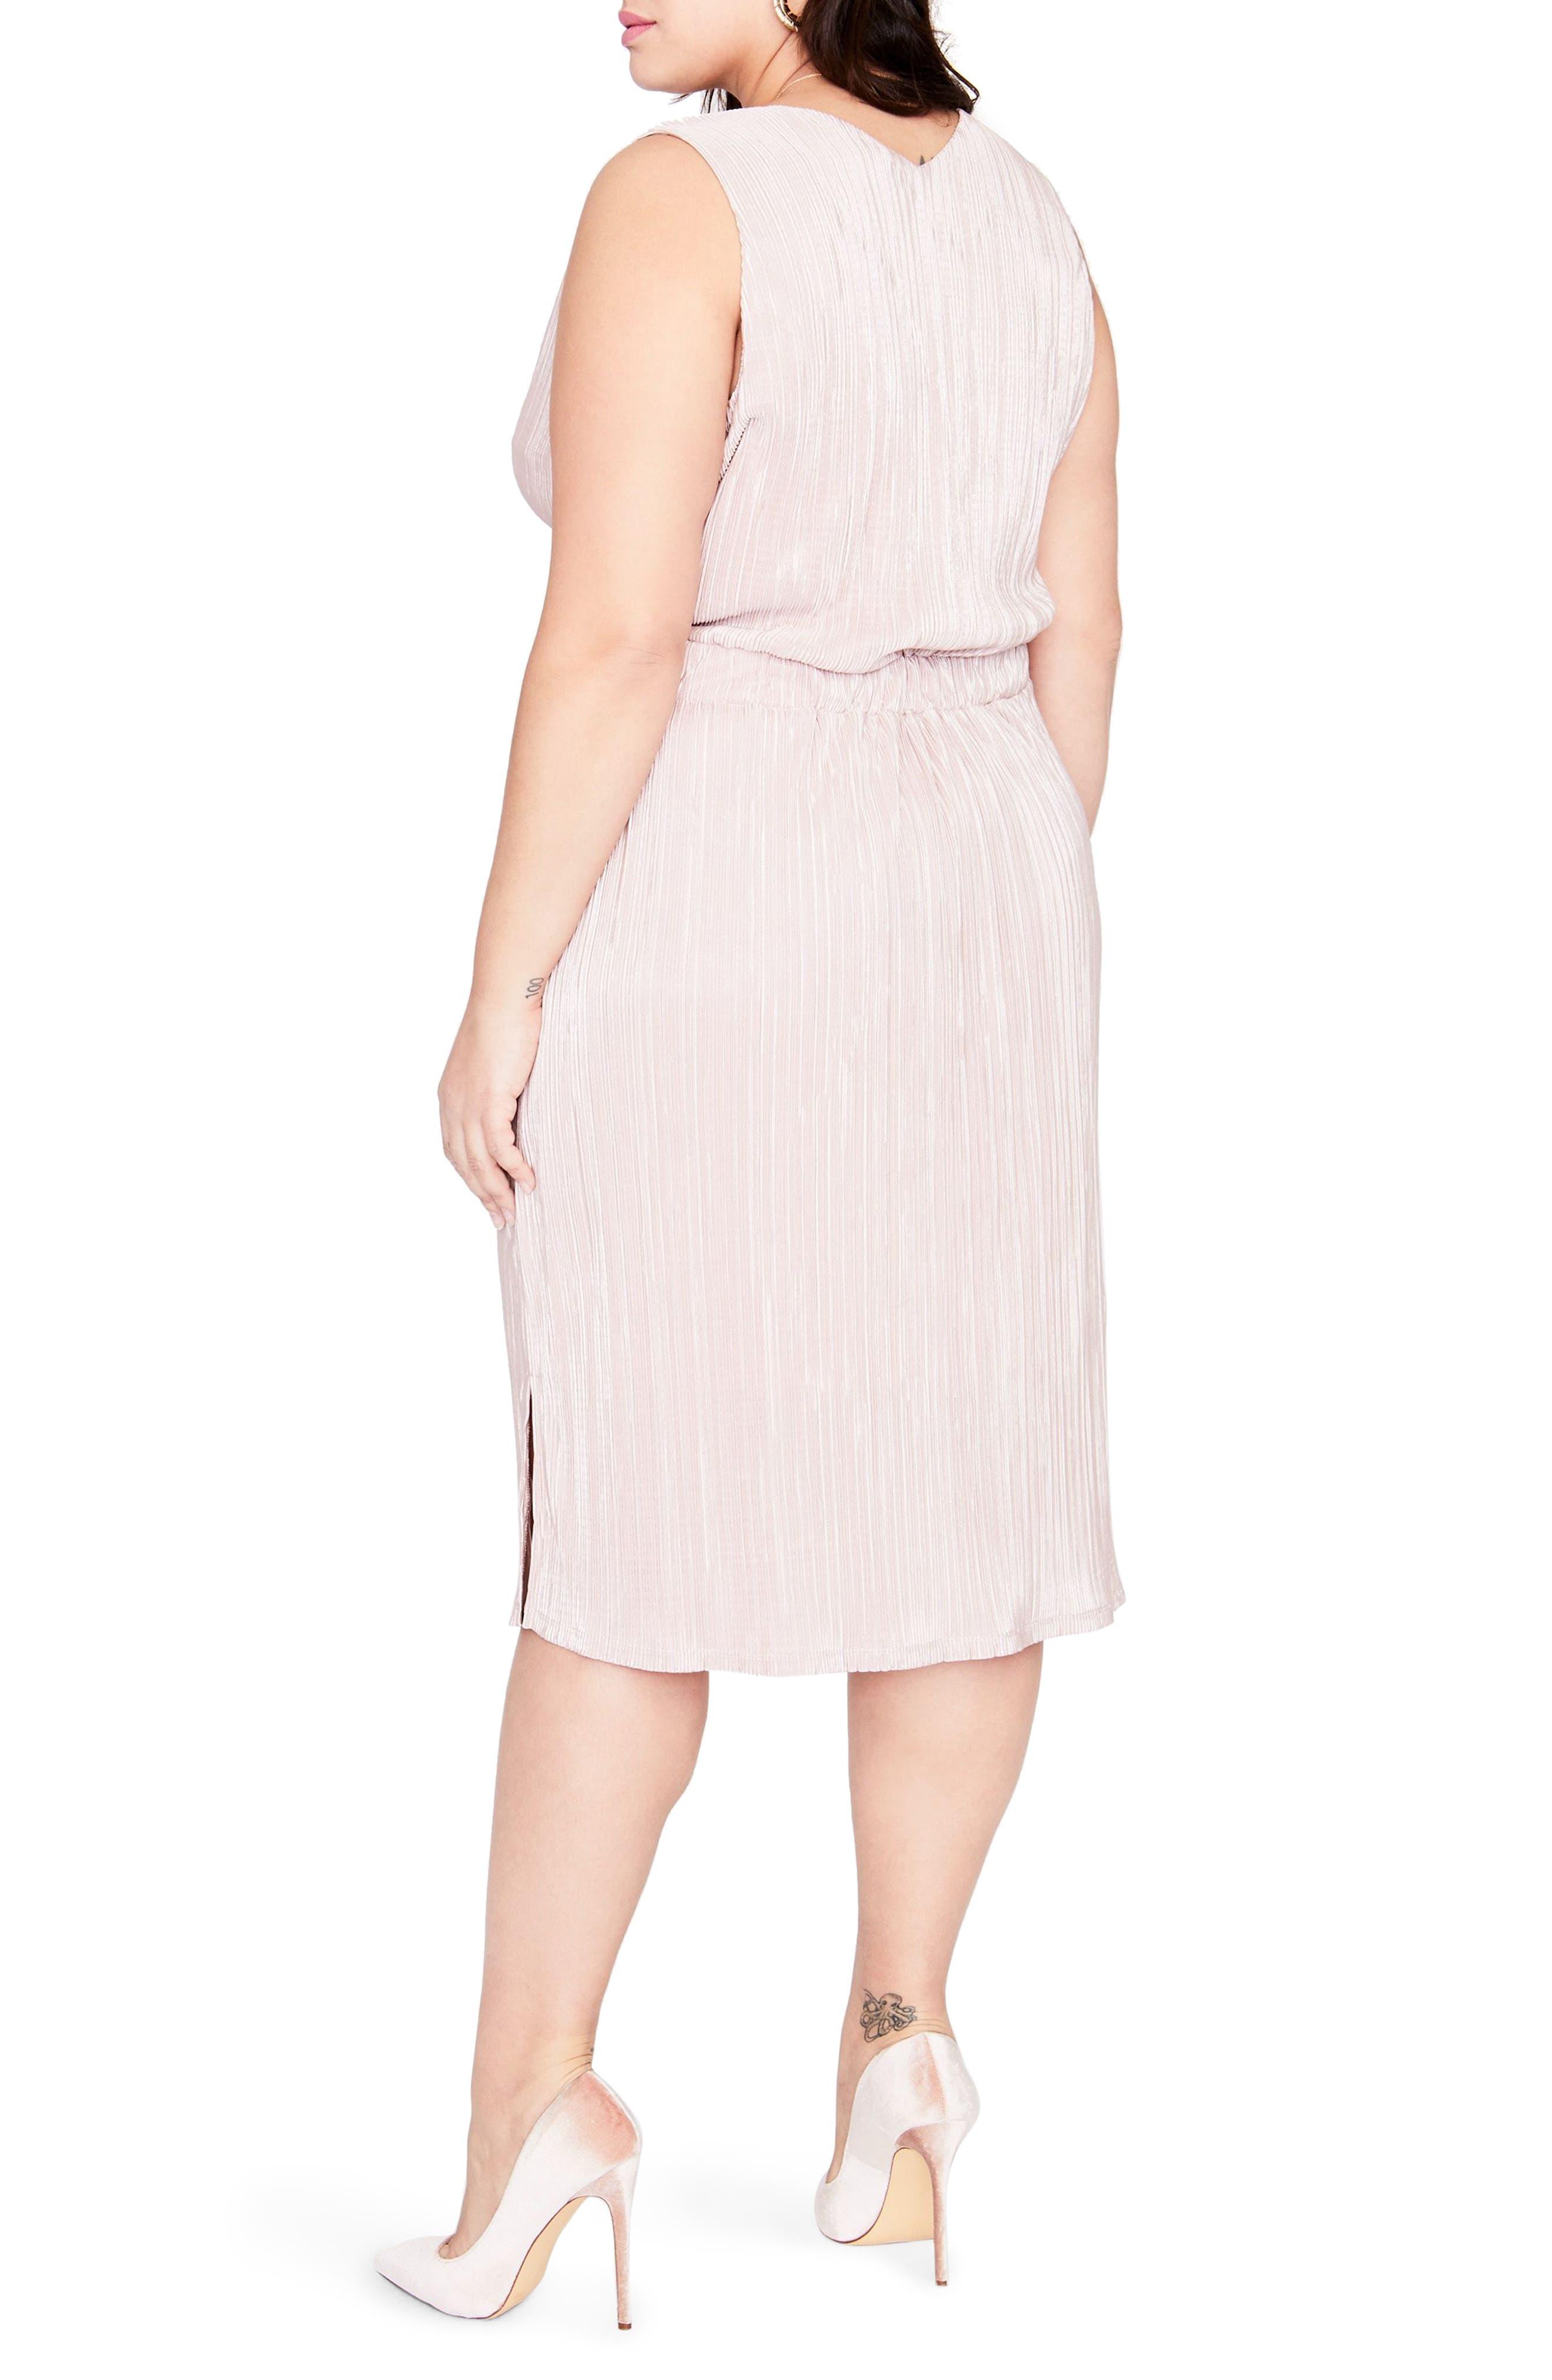 Belted Metallic Pleated Blouson Dress,                             Alternate thumbnail 2, color,                             Blush Combo